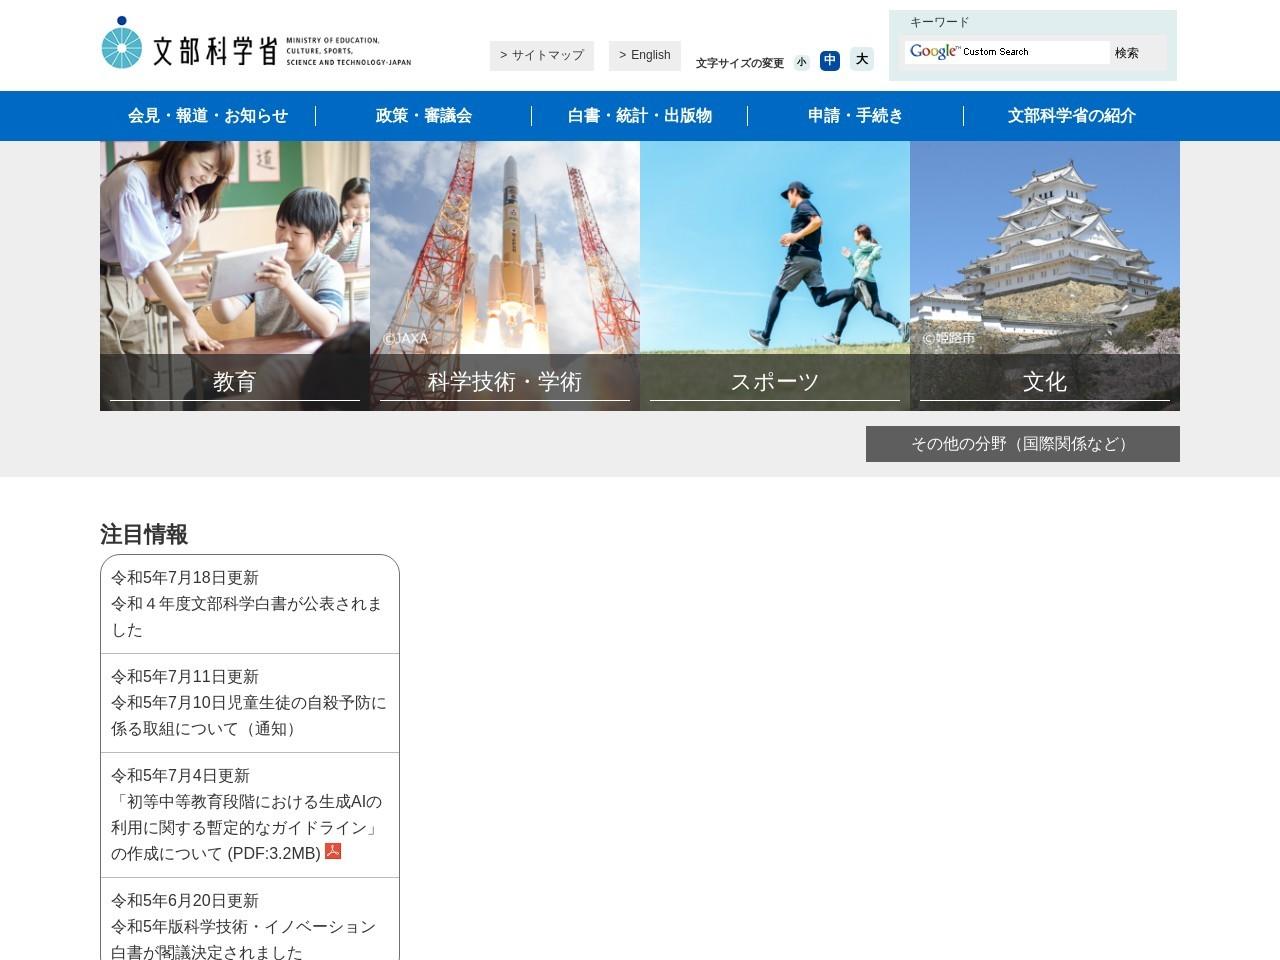 http://www.mext.go.jp/a_menu/sports/jyujitsu/1348589.htm